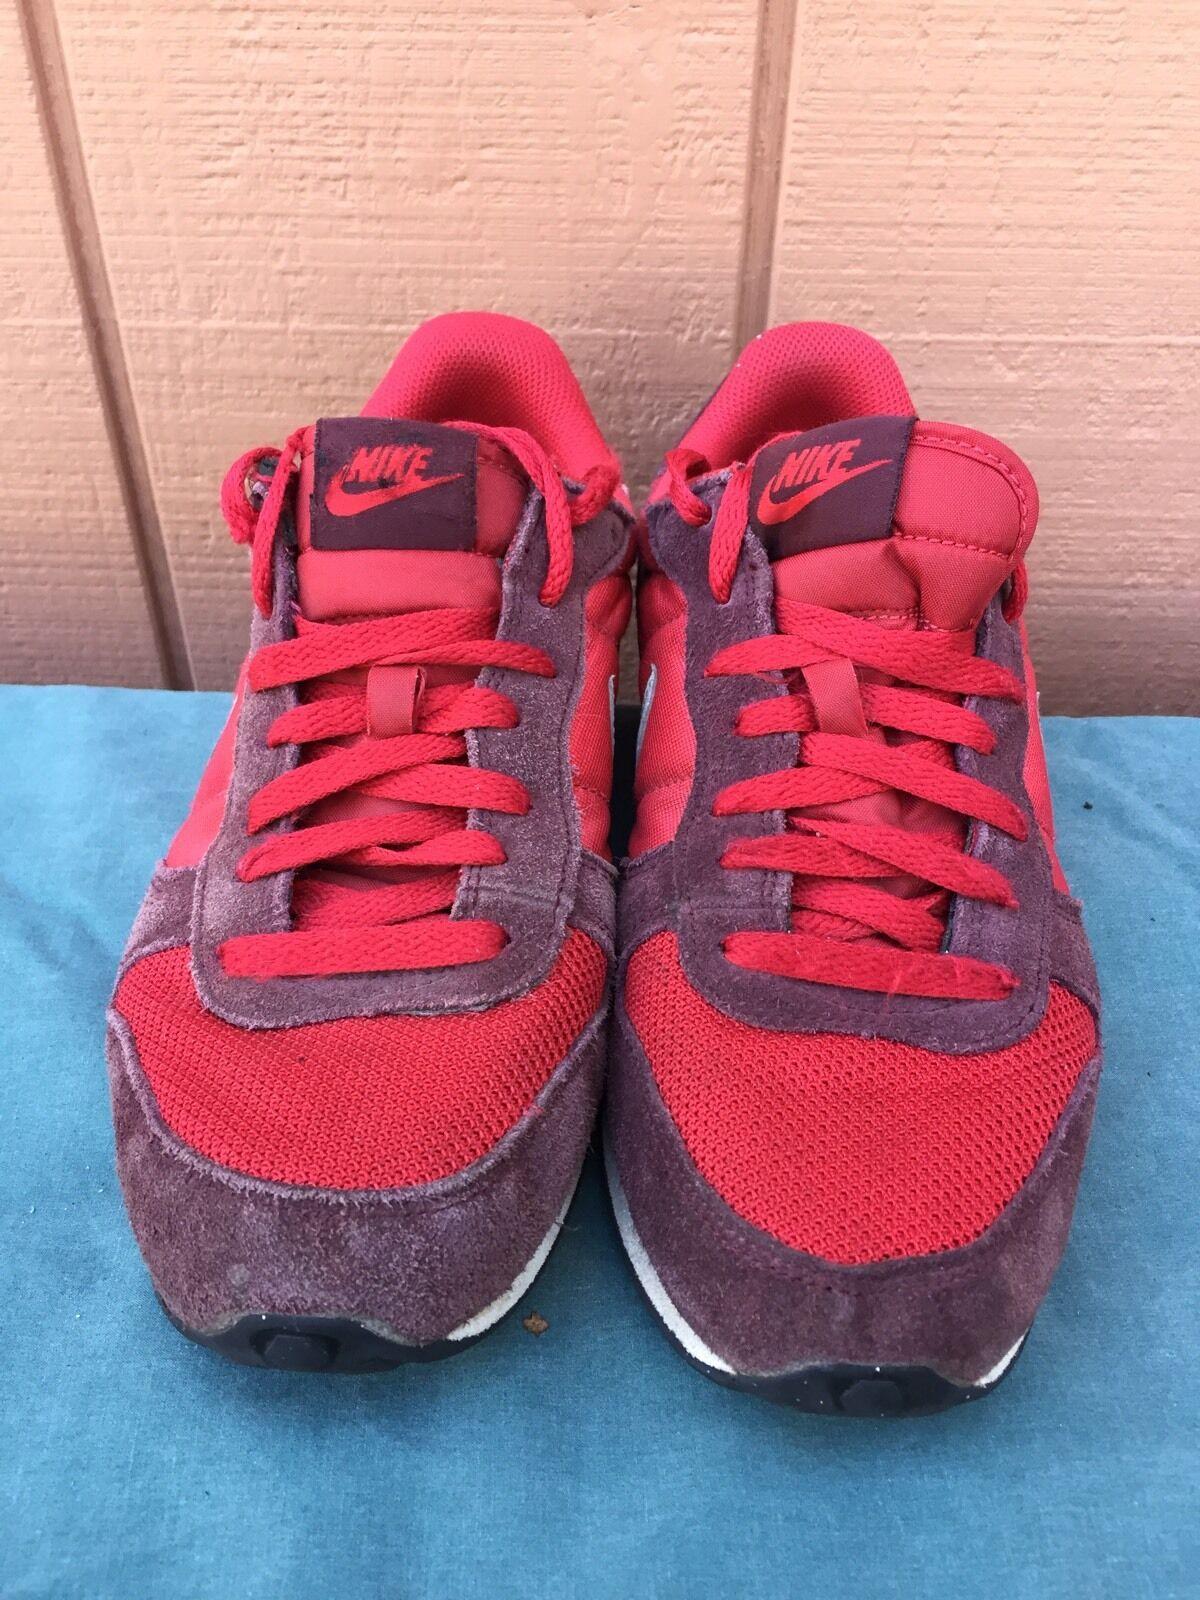 RARE NIKE Genicco Red White Men's Running Shoes 644441-606 US Sz 8 EU 41